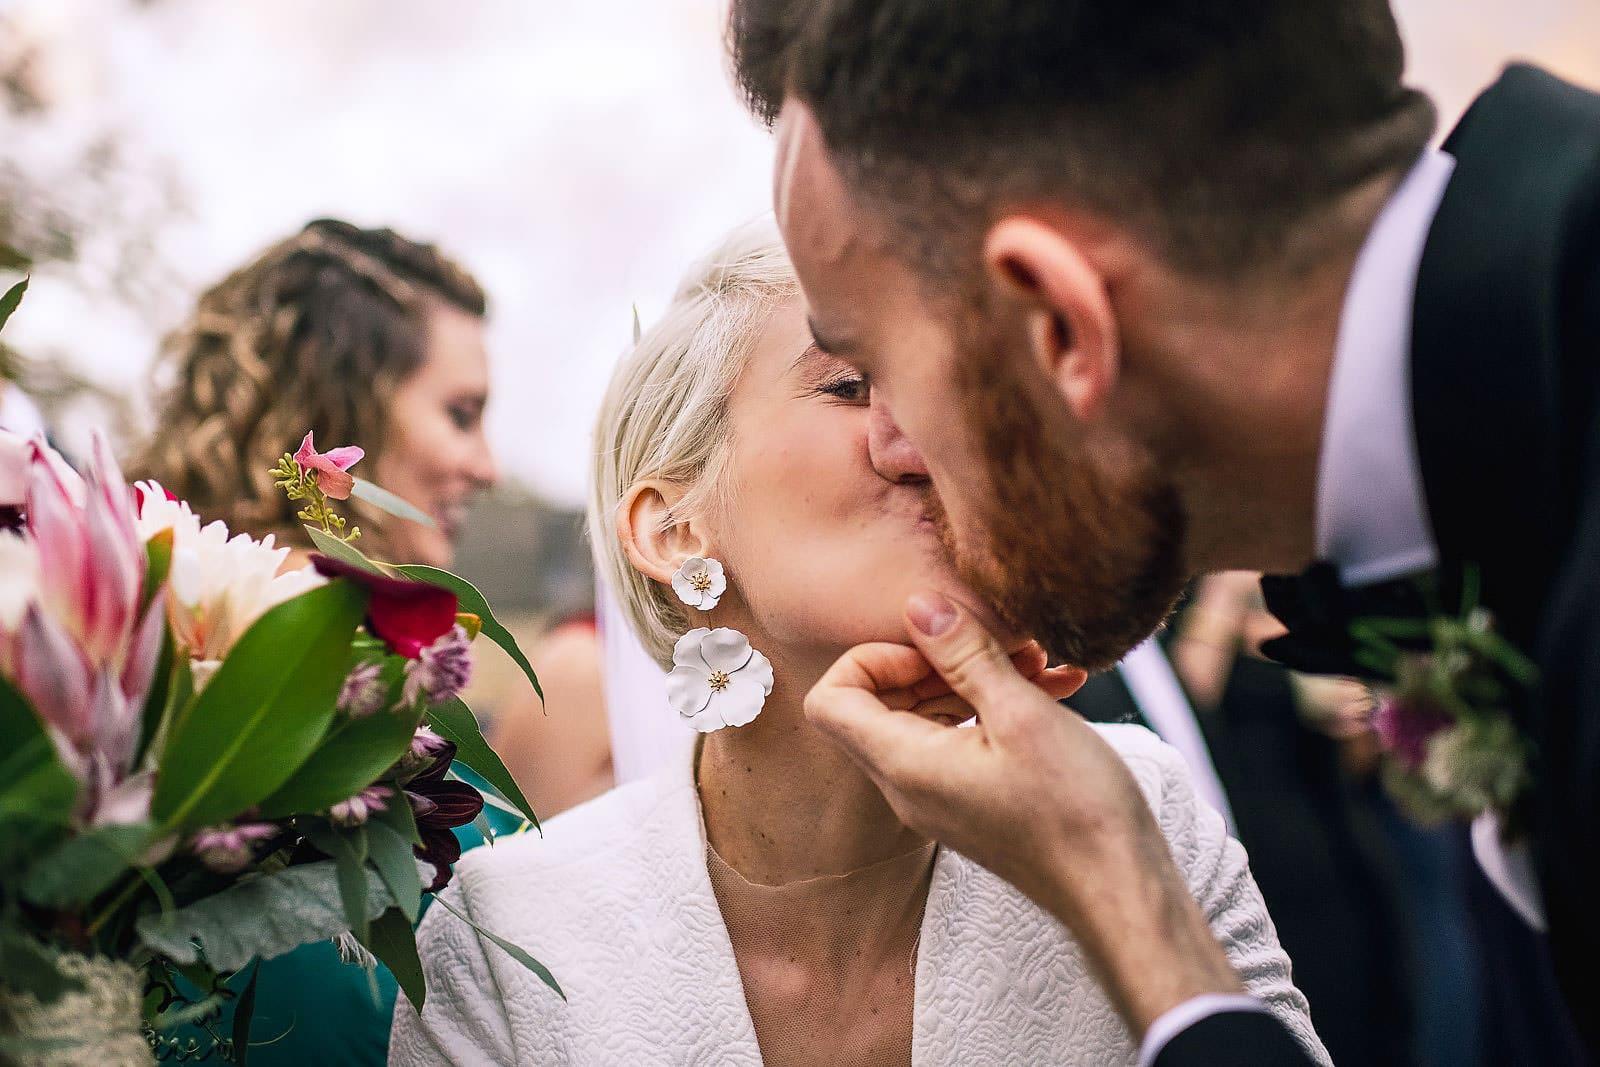 Soho Farmhouse event or wedding